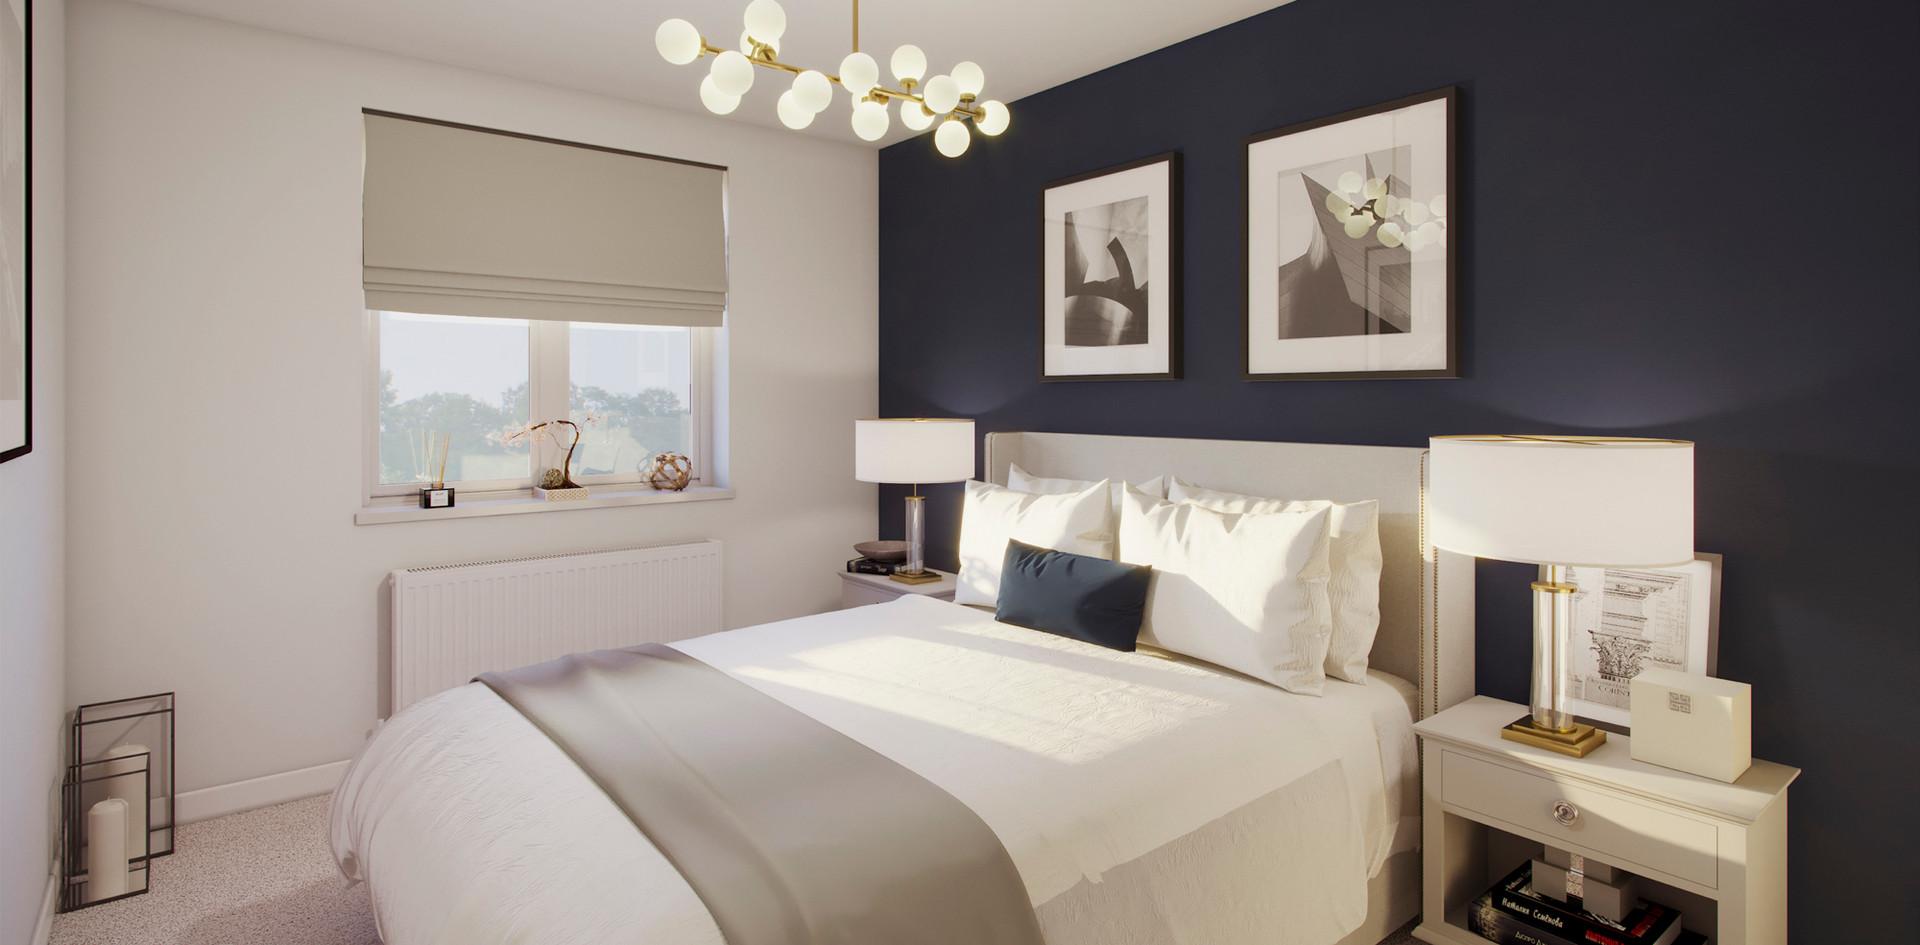 62 Frimley -Bedroom_1.JPG